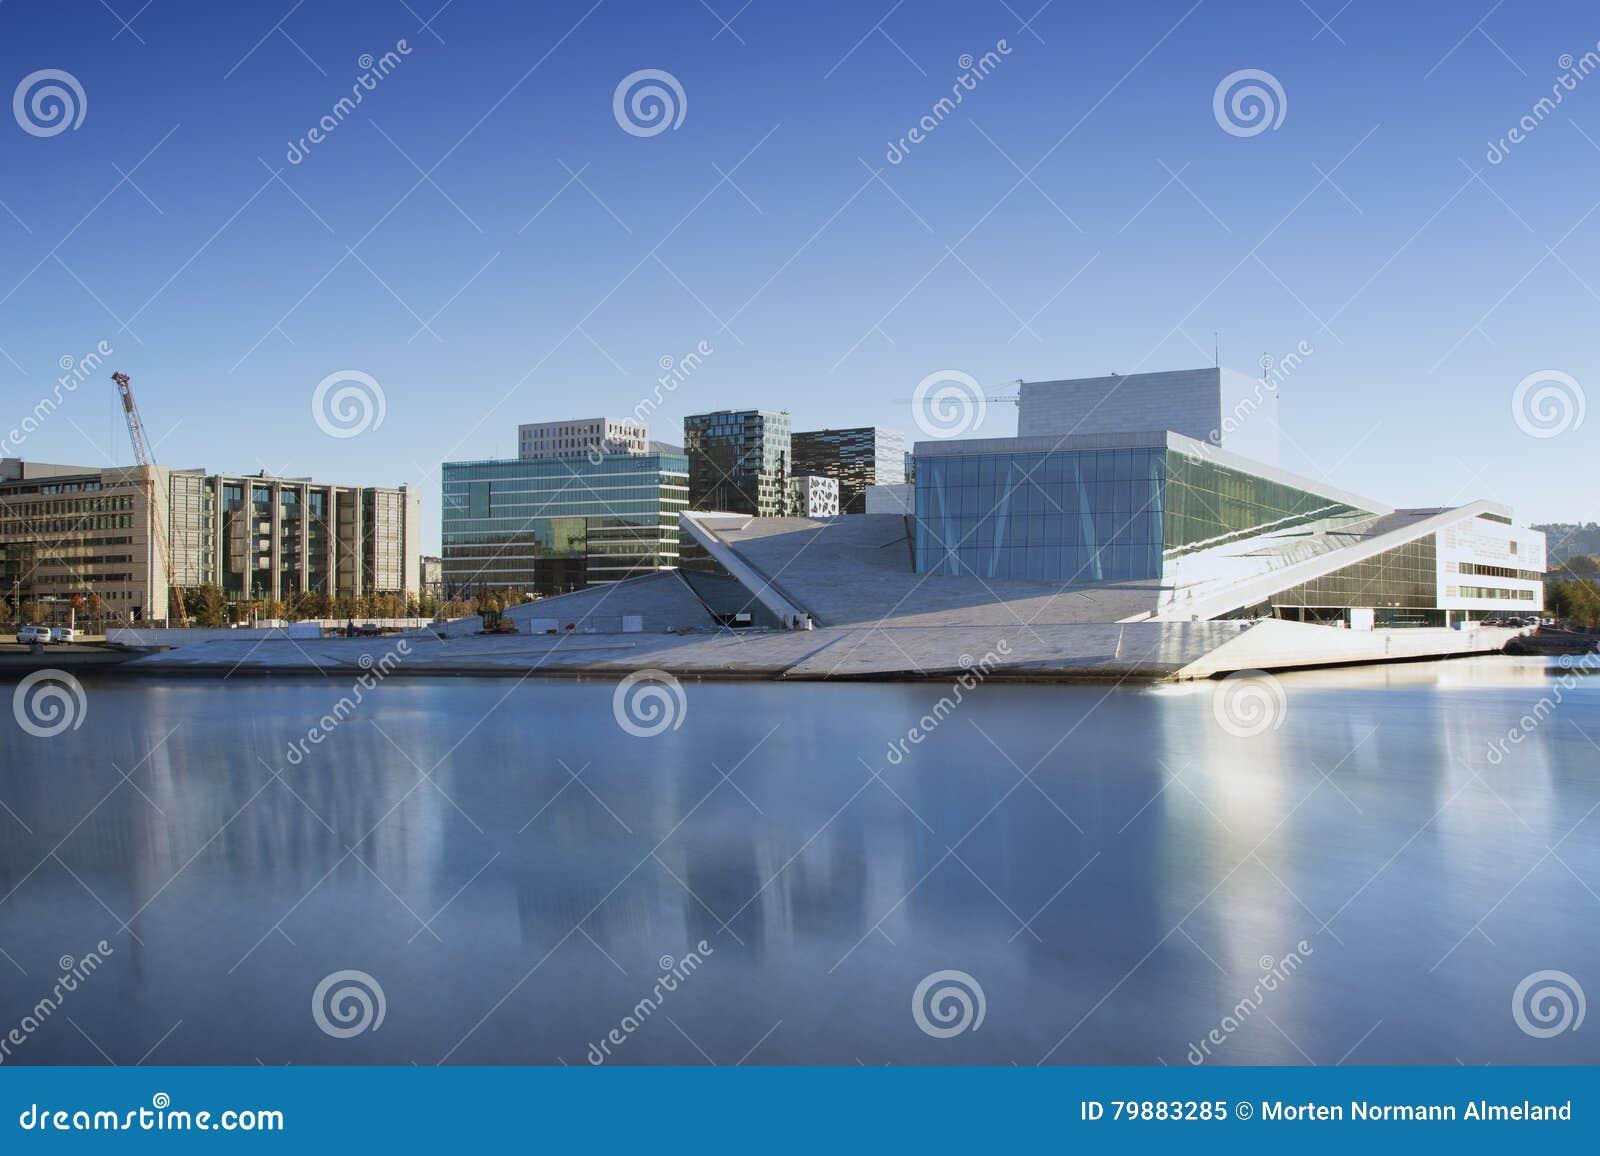 Teatro da ópera de Oslo em Noruega